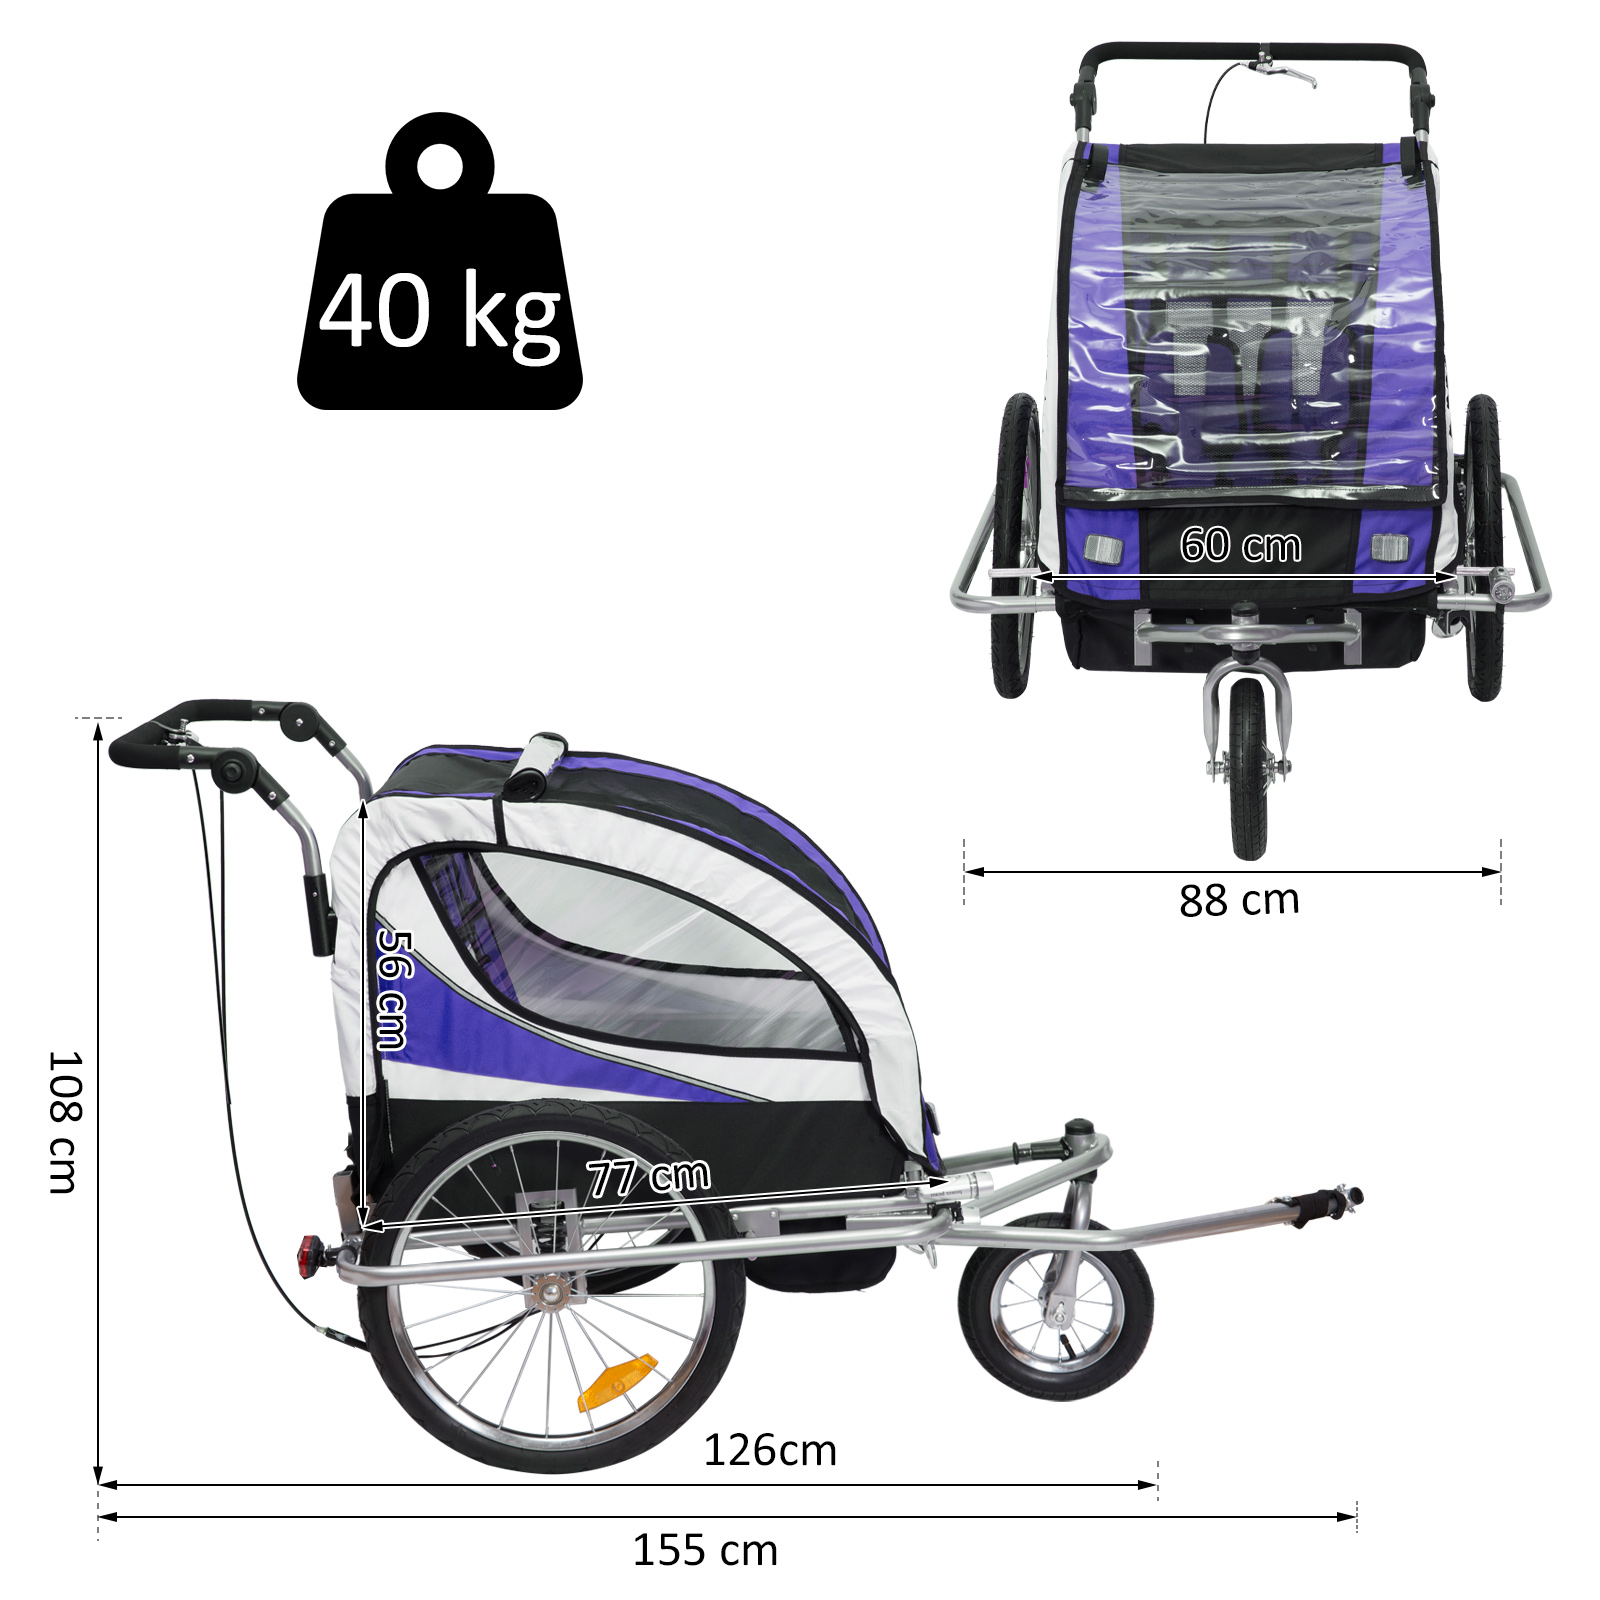 miniatura 44 - Remolque para Bicicleta tipo Carro con Barra de Paseo para Niños de 2 Plazas NUE